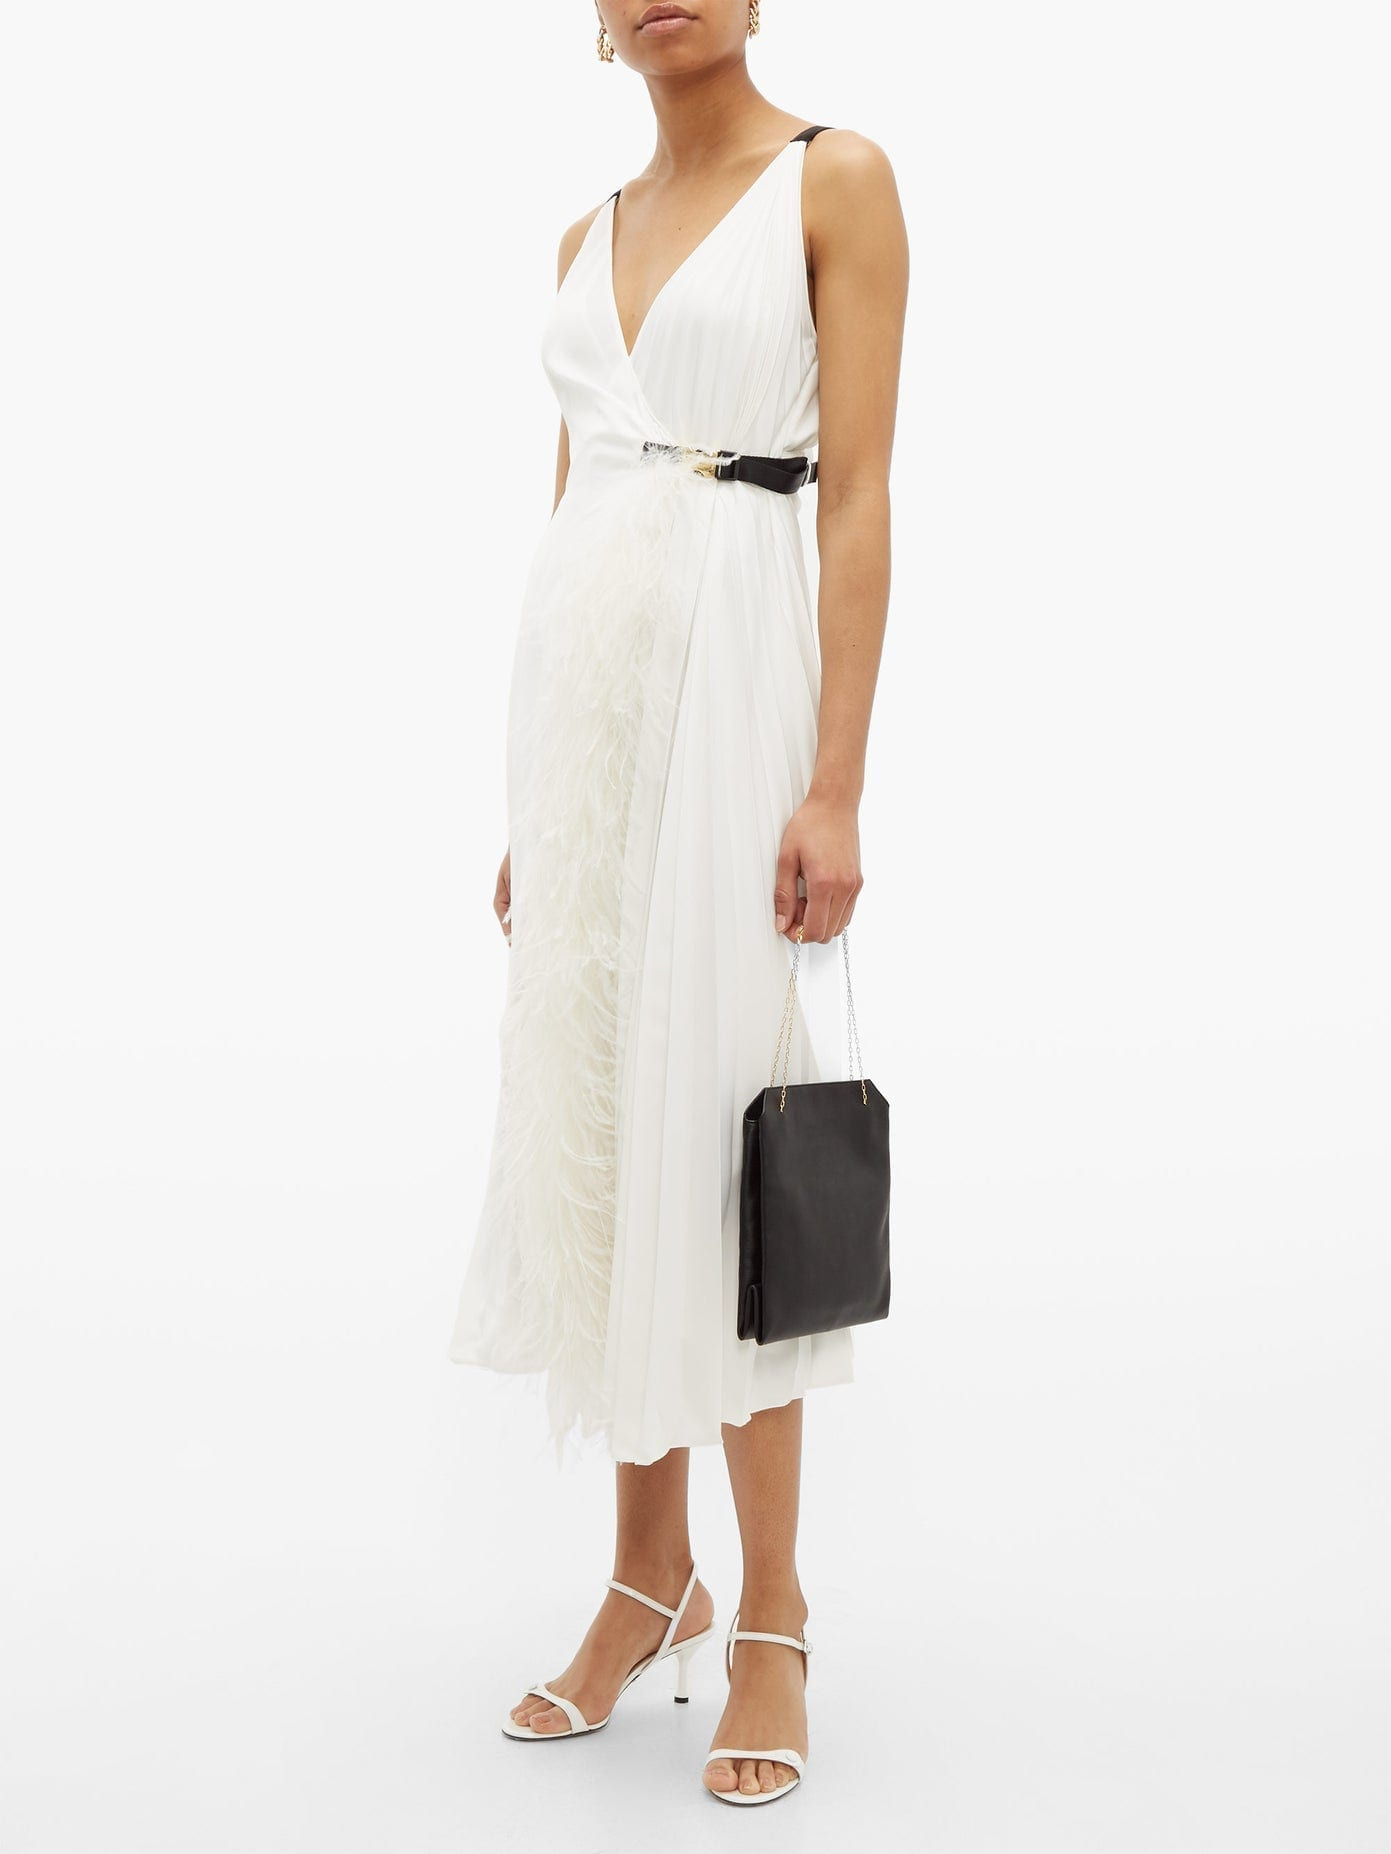 PRADA Feather-trimmed Pleated Wrap Dress